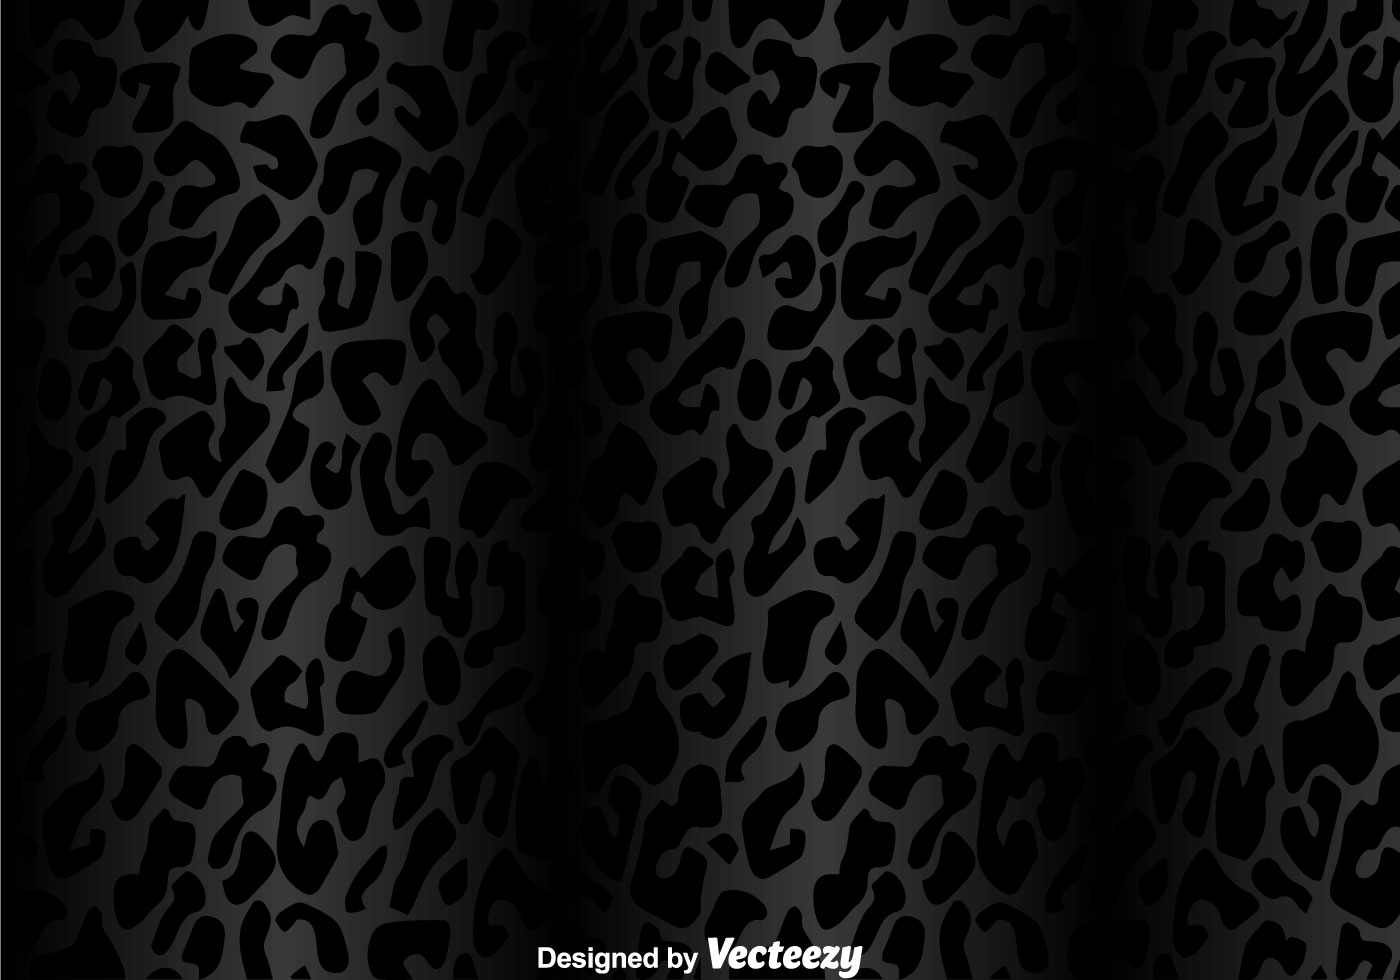 black leopard pattern download free vector art  stock graphics   images free vector filigree vector filigree border